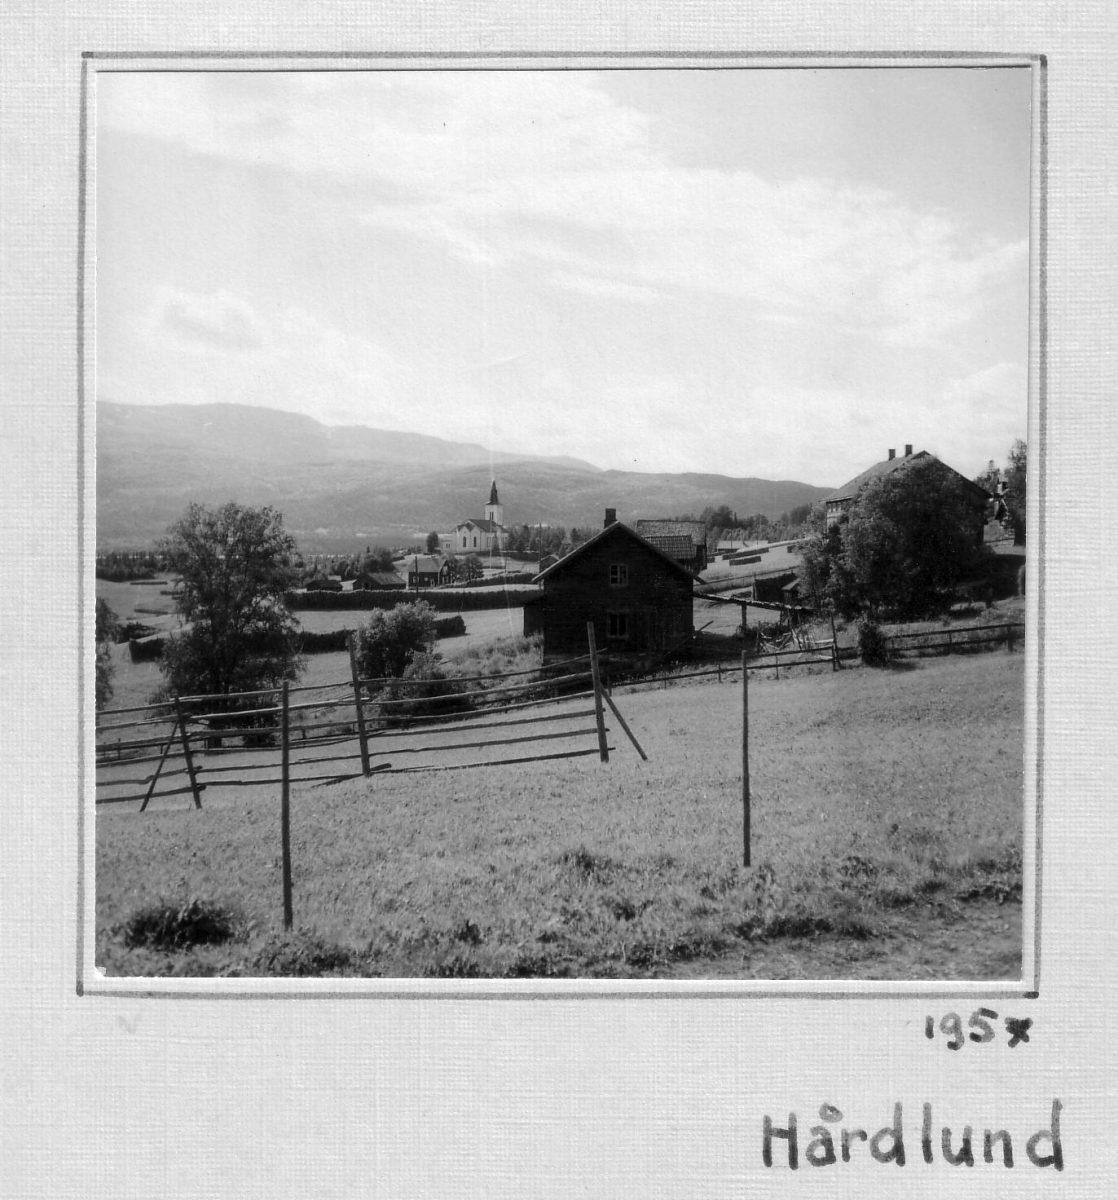 S.45 Hårdlund 1957 Bild 2